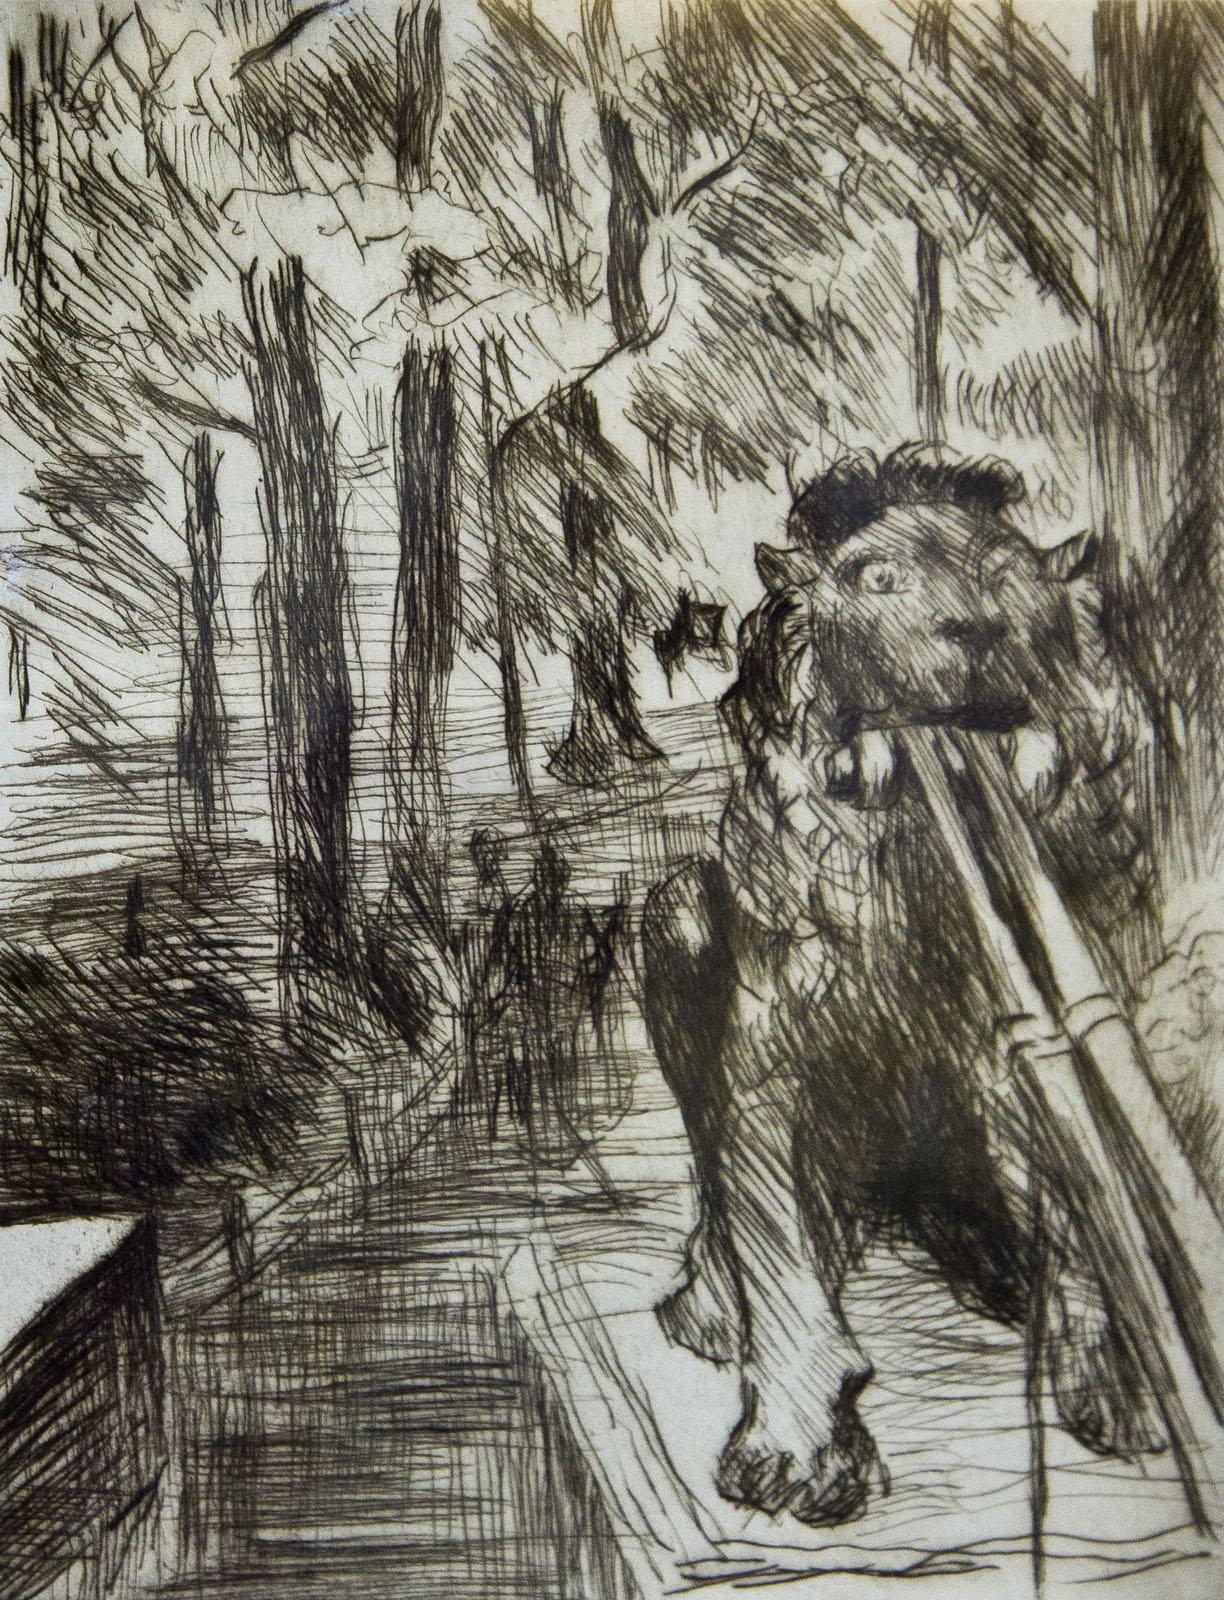 Фото №76522. Мост со львами в берлинском Тиргартене. 1919. Ловис Коринт (1858-1925)